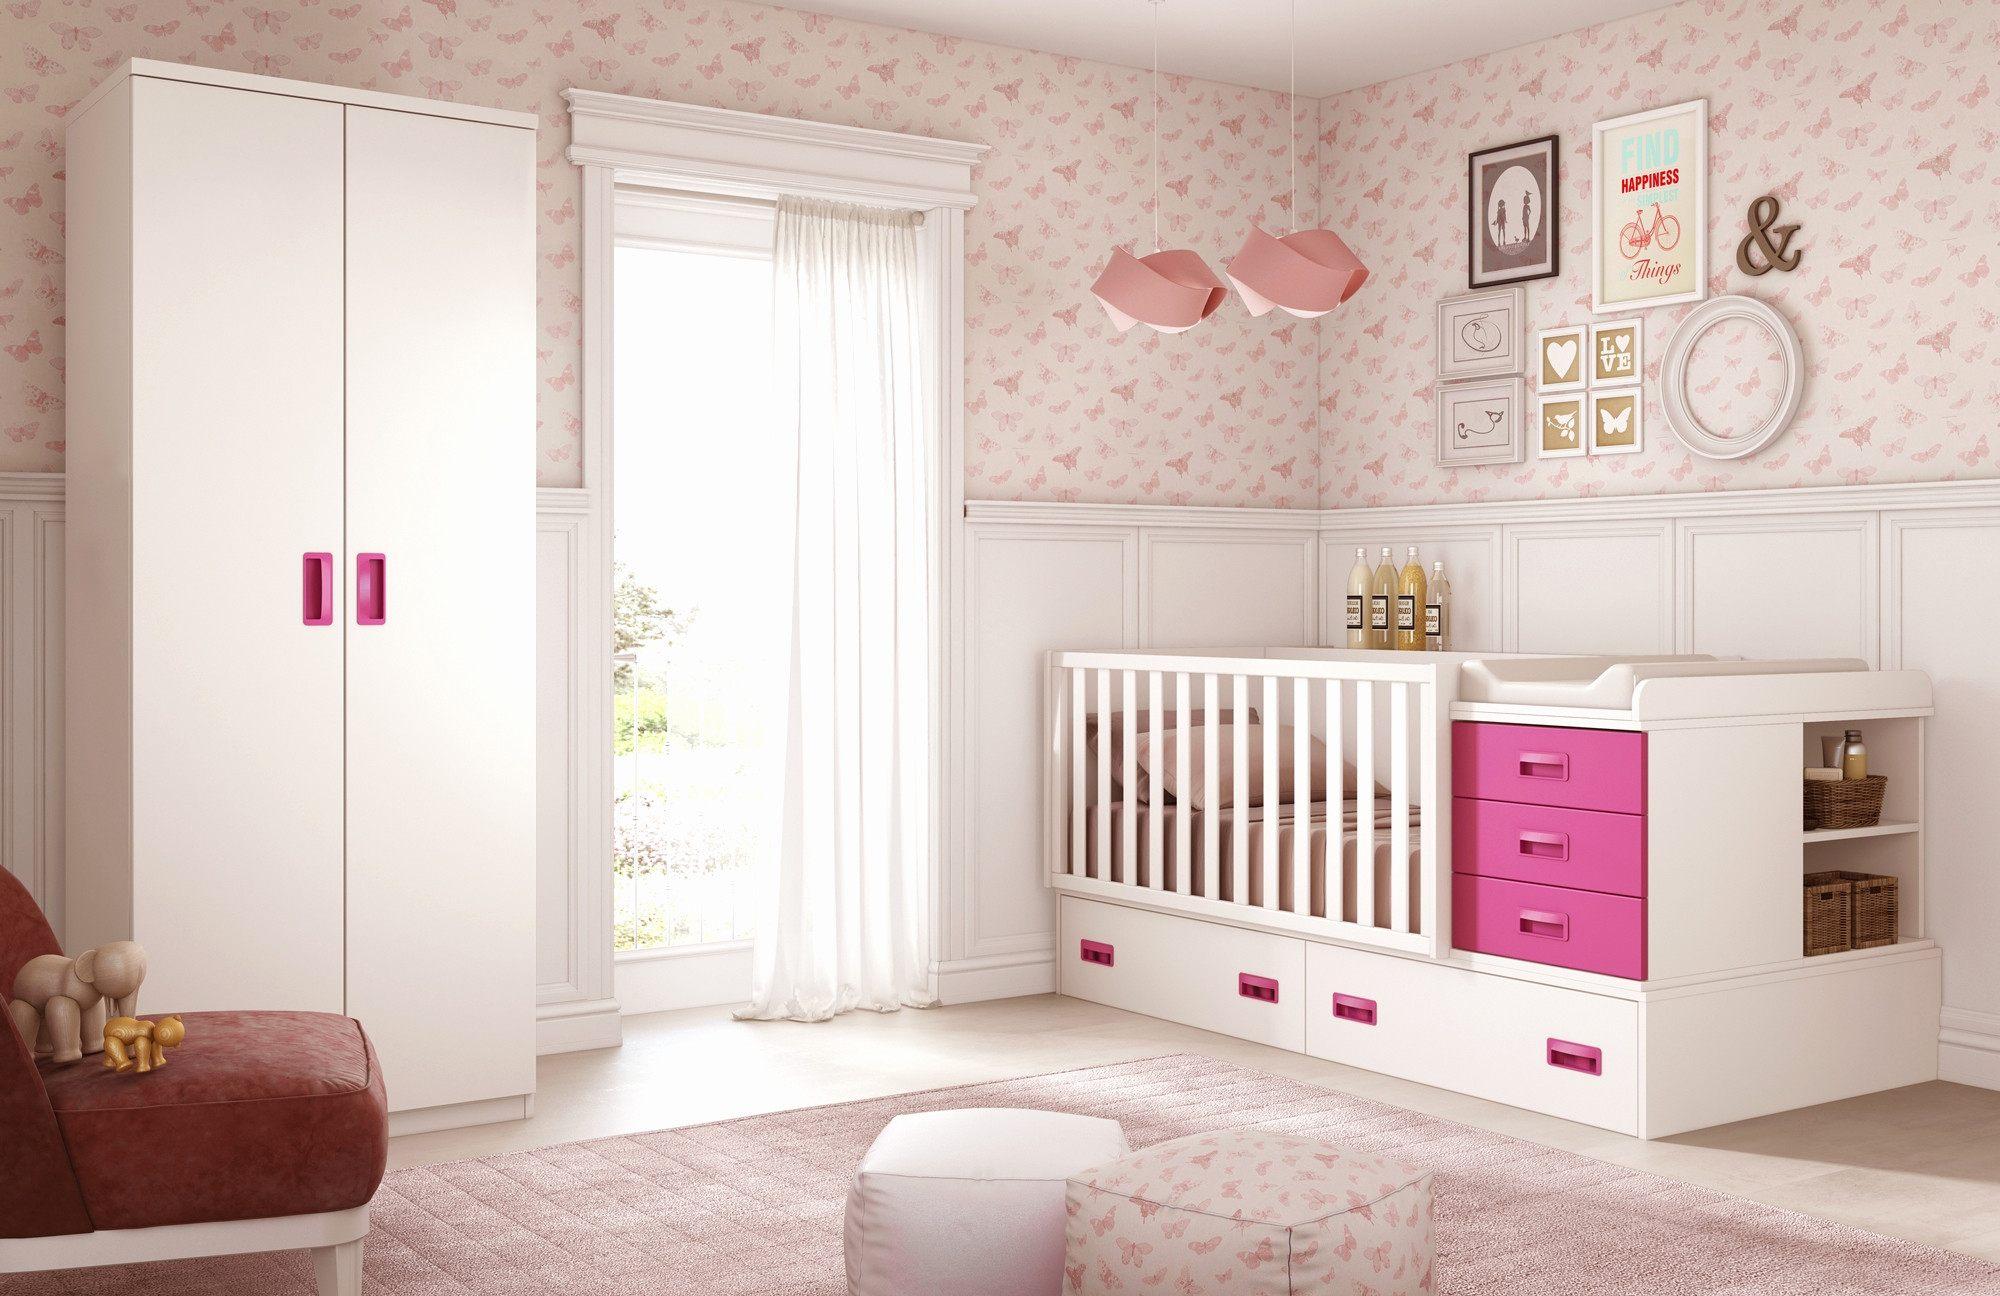 Lit Bebe solde De Luxe Lit Bebe Jusqu A Quel Age Chambre Evolutive Génial Bebe Chambre